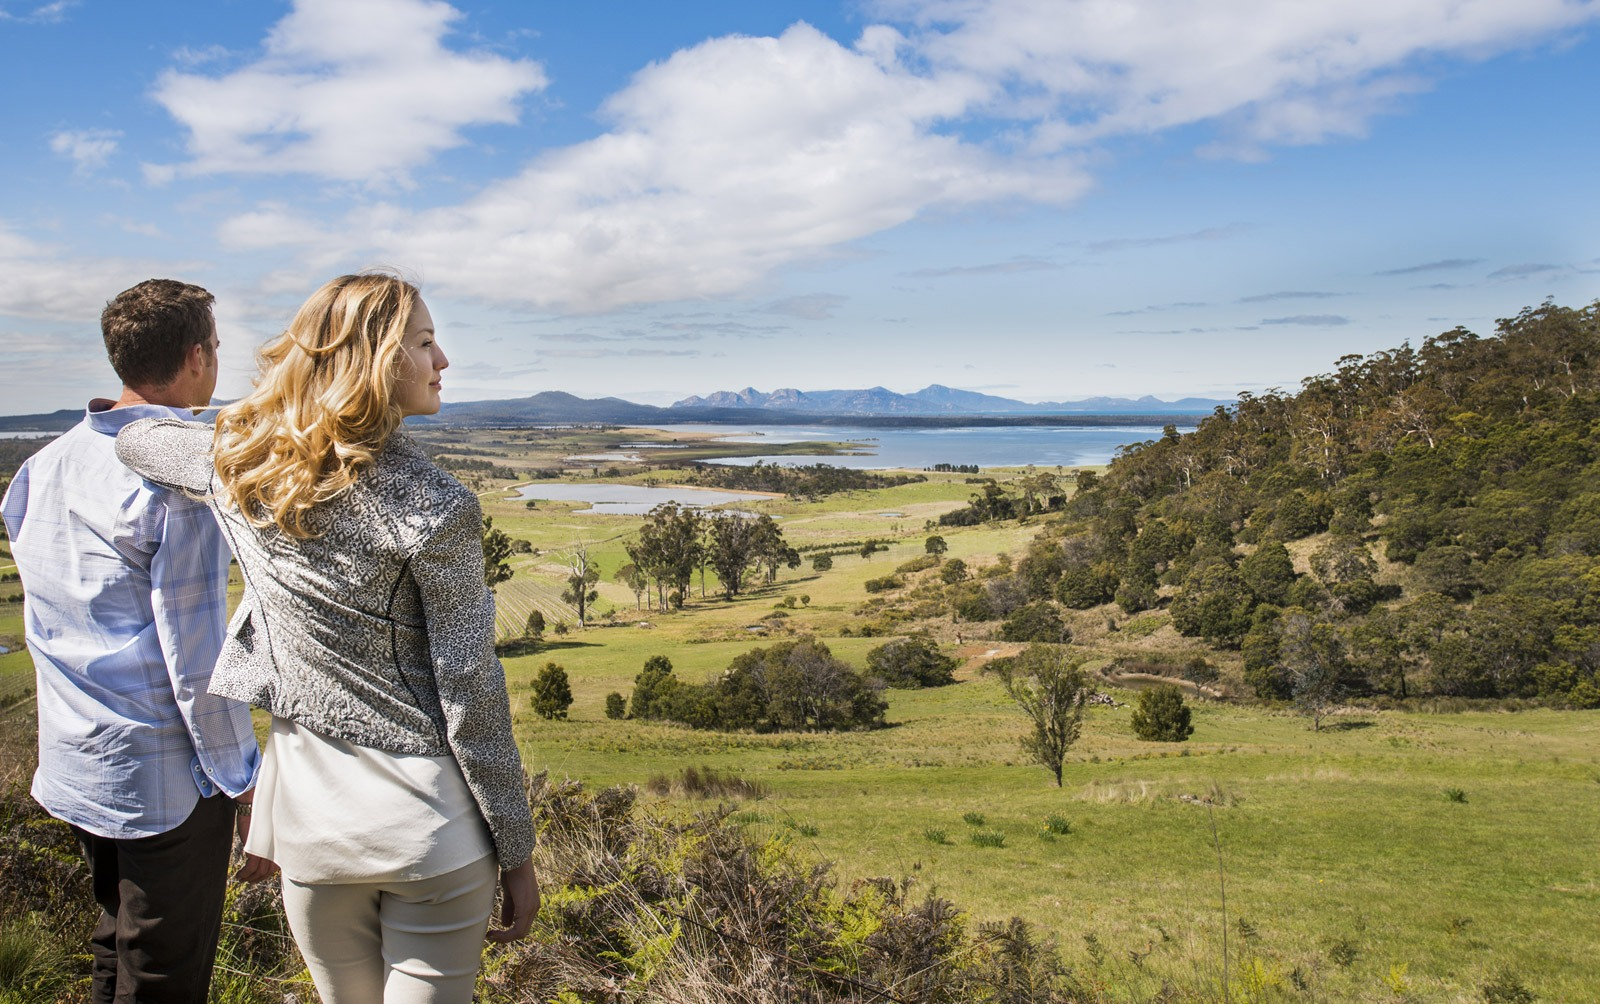 Australian Leadlighting Dating Expert Top Bdsm Dating Sites Cvi Noticias